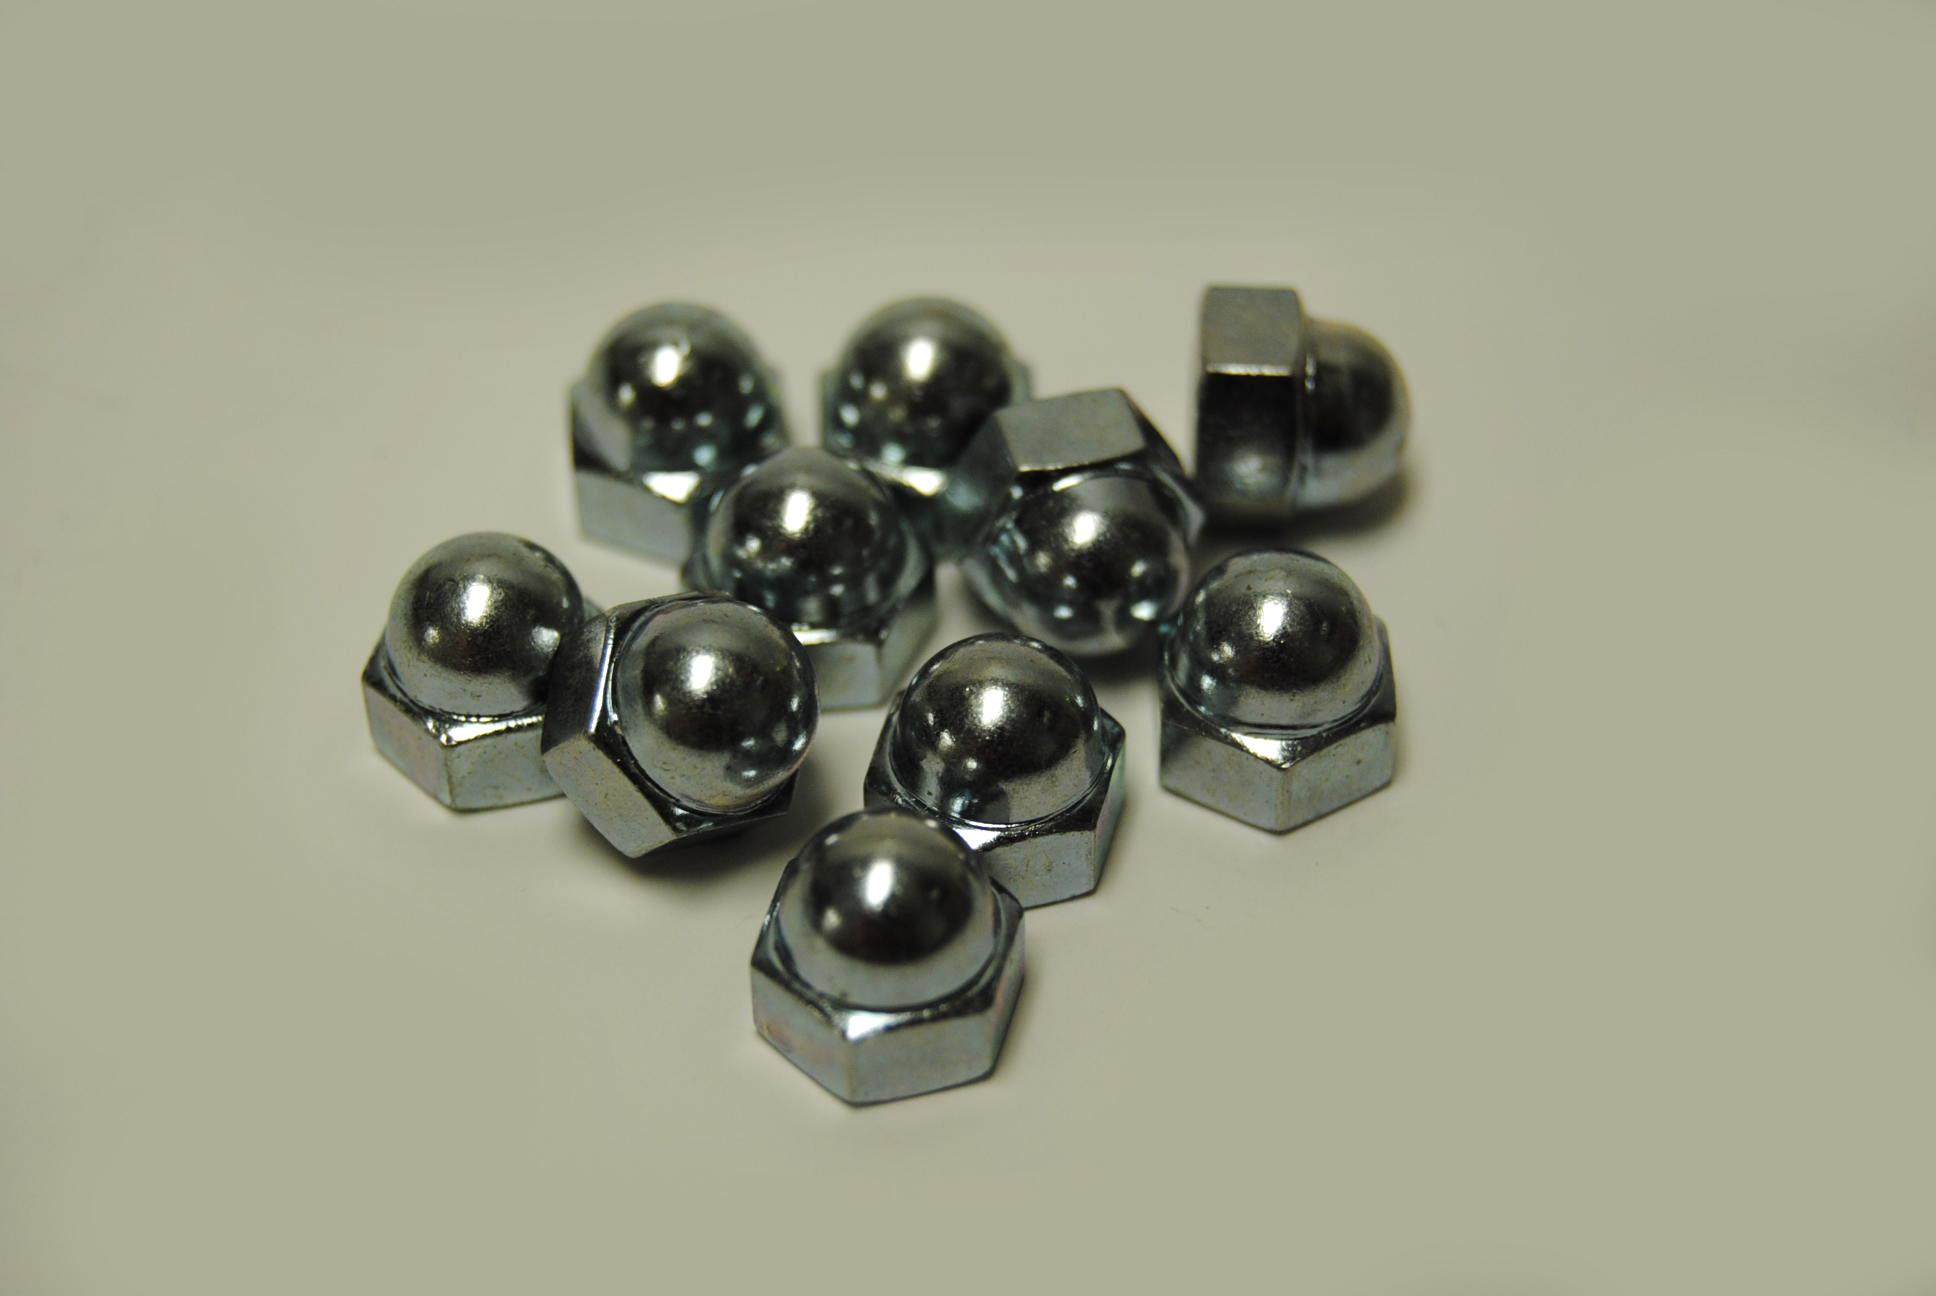 6mm Cap Nuts (Acorn) - ISO